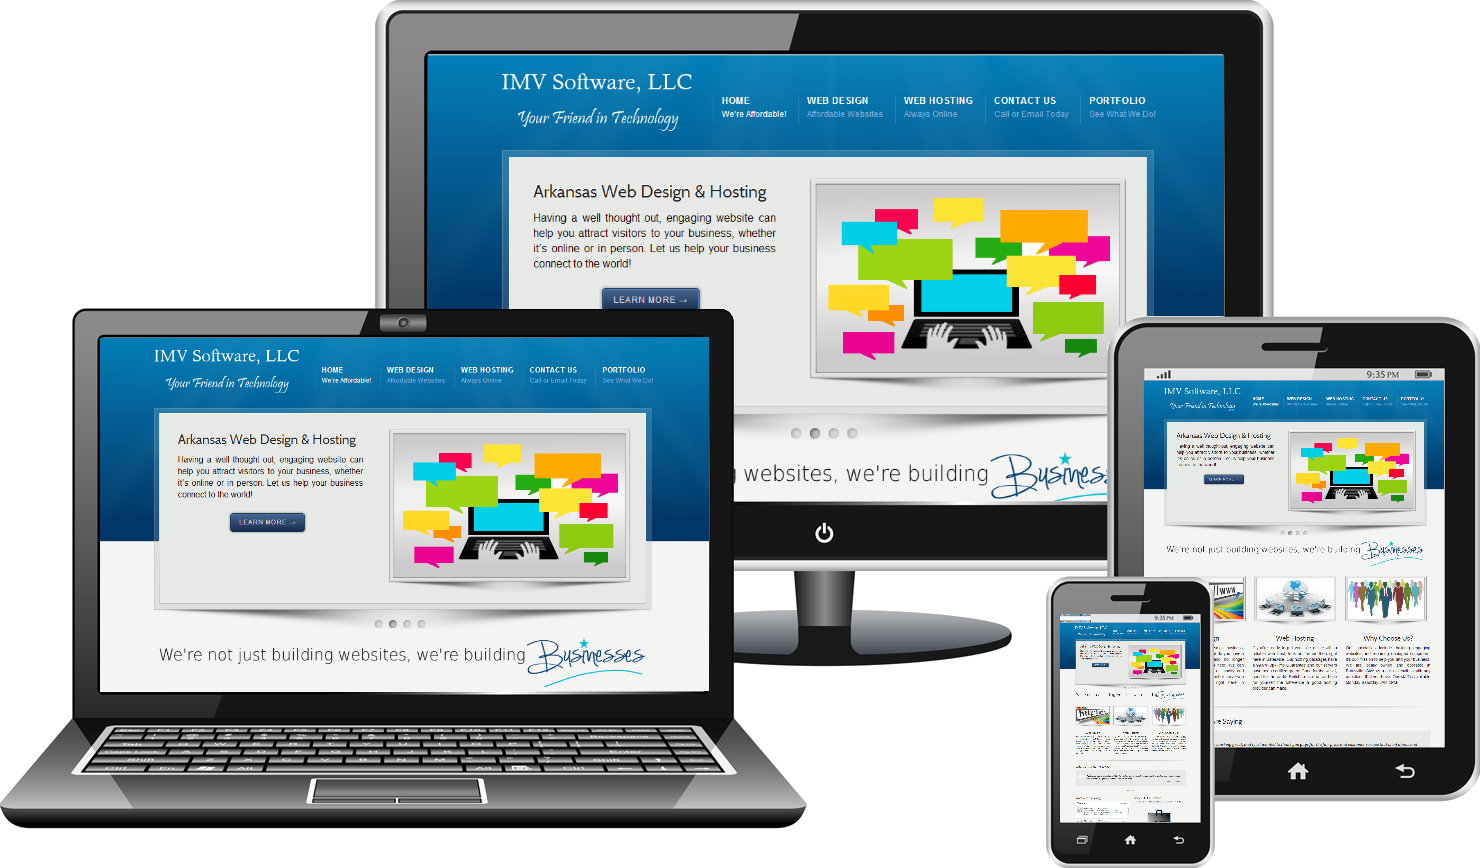 Website clipart web development. Design png transparent images